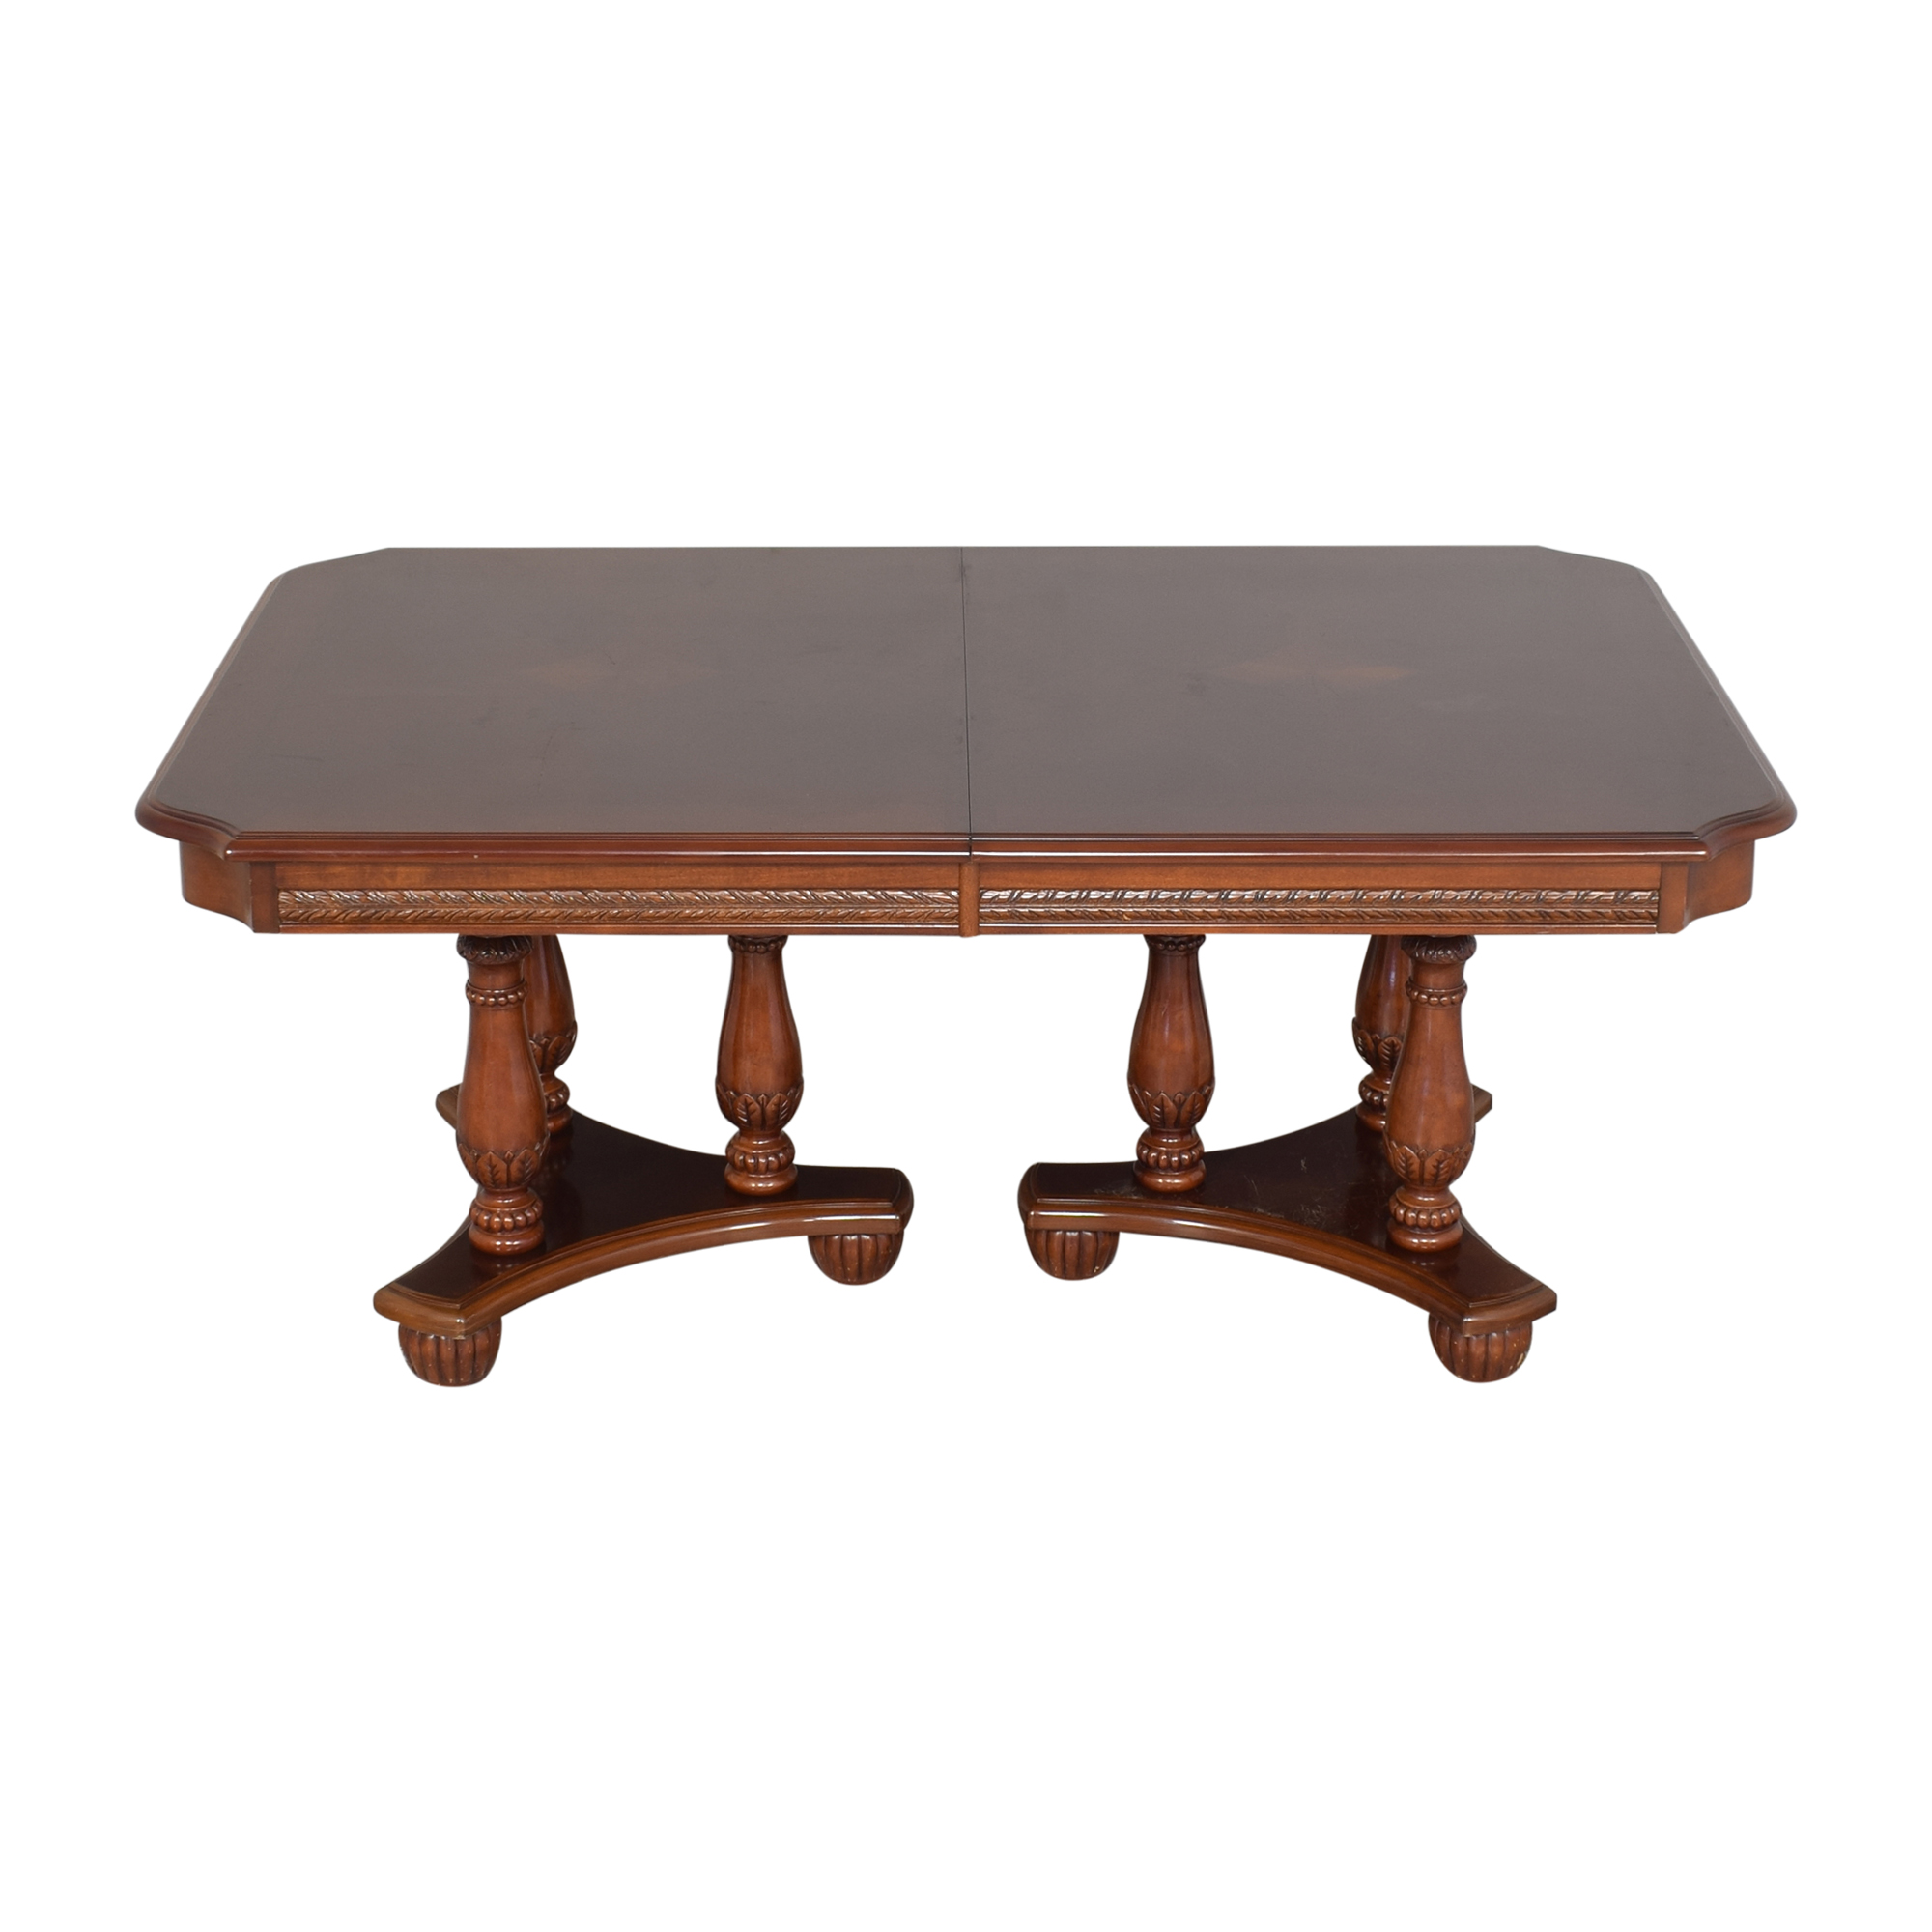 North Carolina Furniture Extendable Dining Table sale